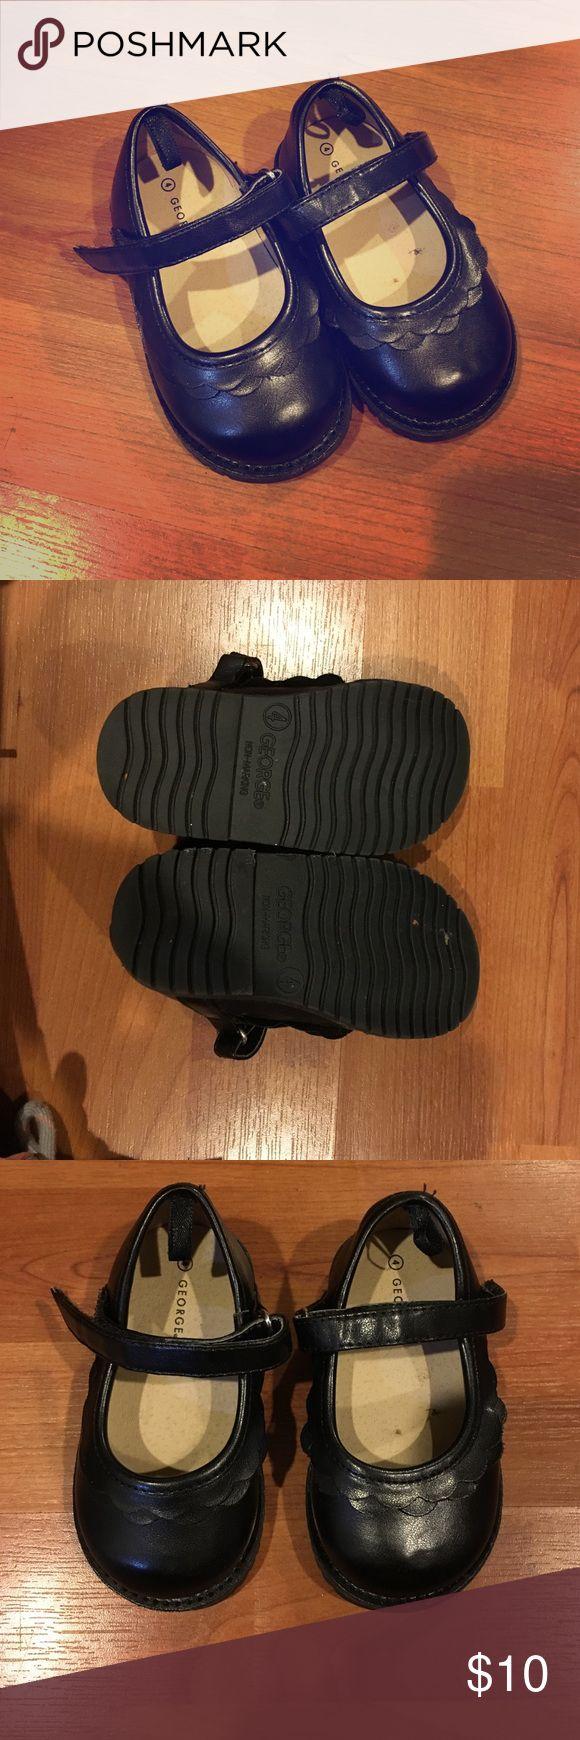 Toddler black dress shoes Black, George size 4 toddler dress shoes. In good condition. George Shoes Dress Shoes